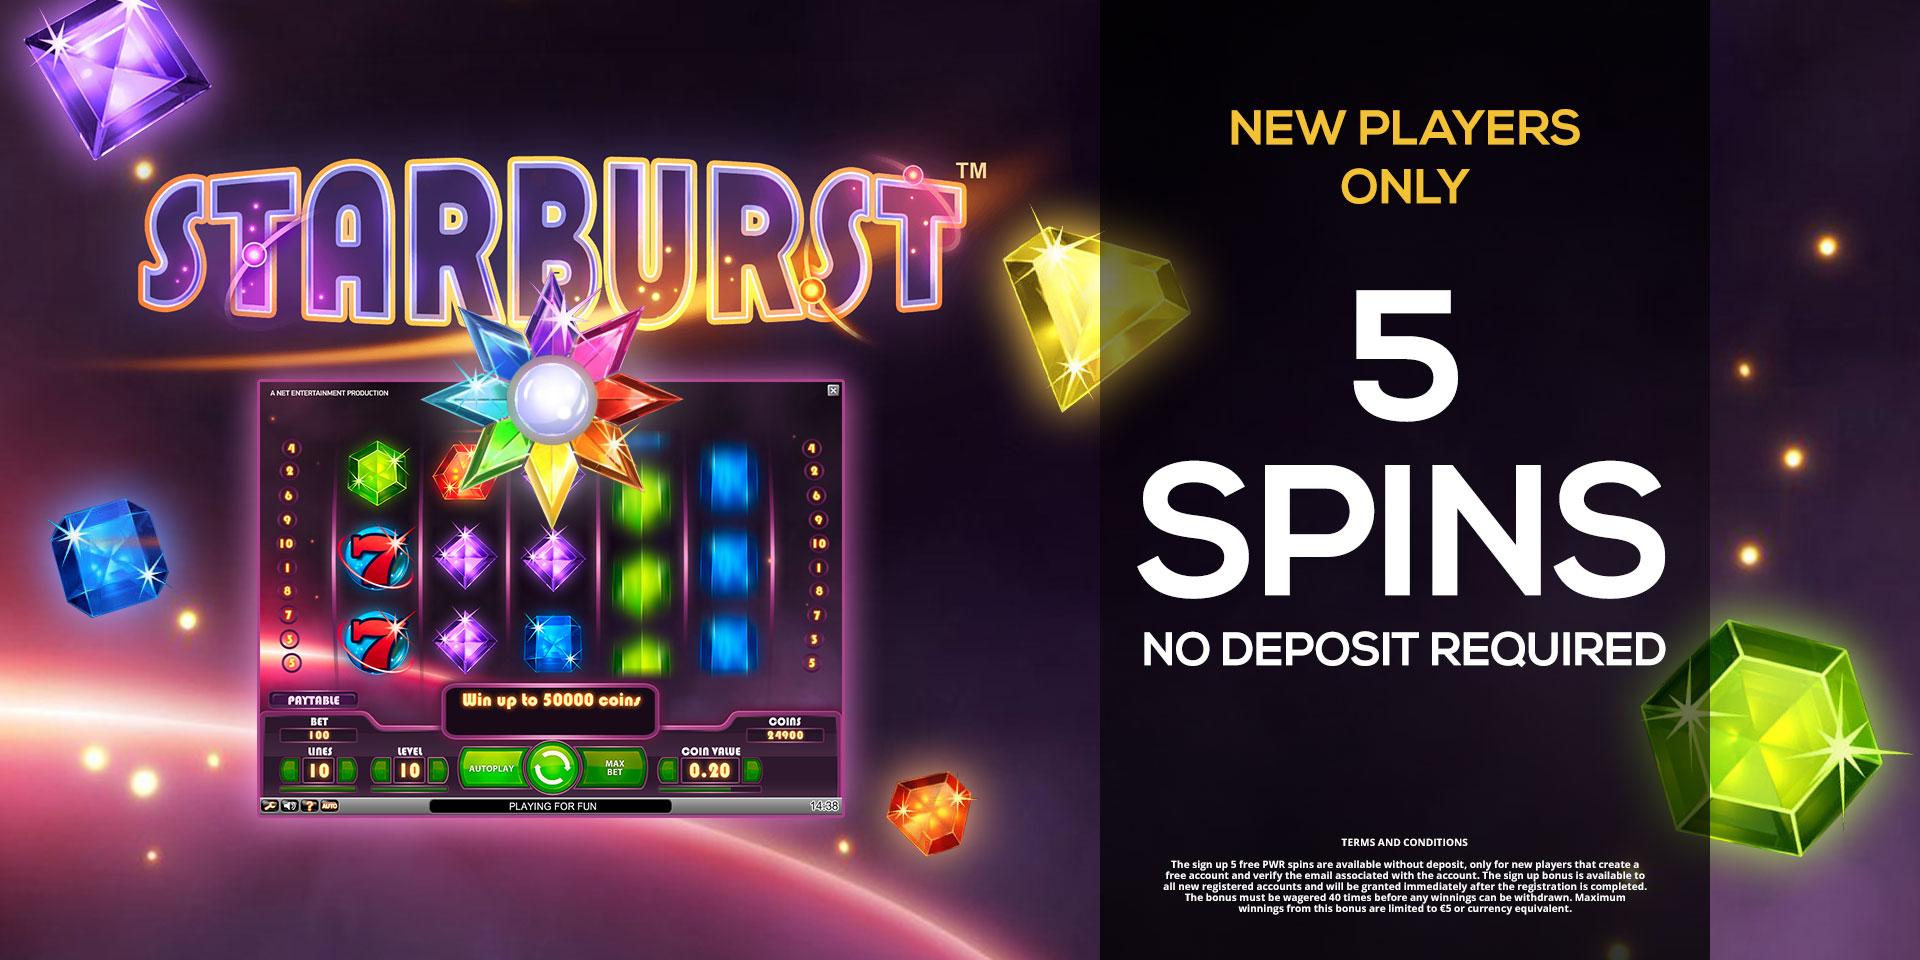 Free Spins No Deposit Bonuses and Codes 2019